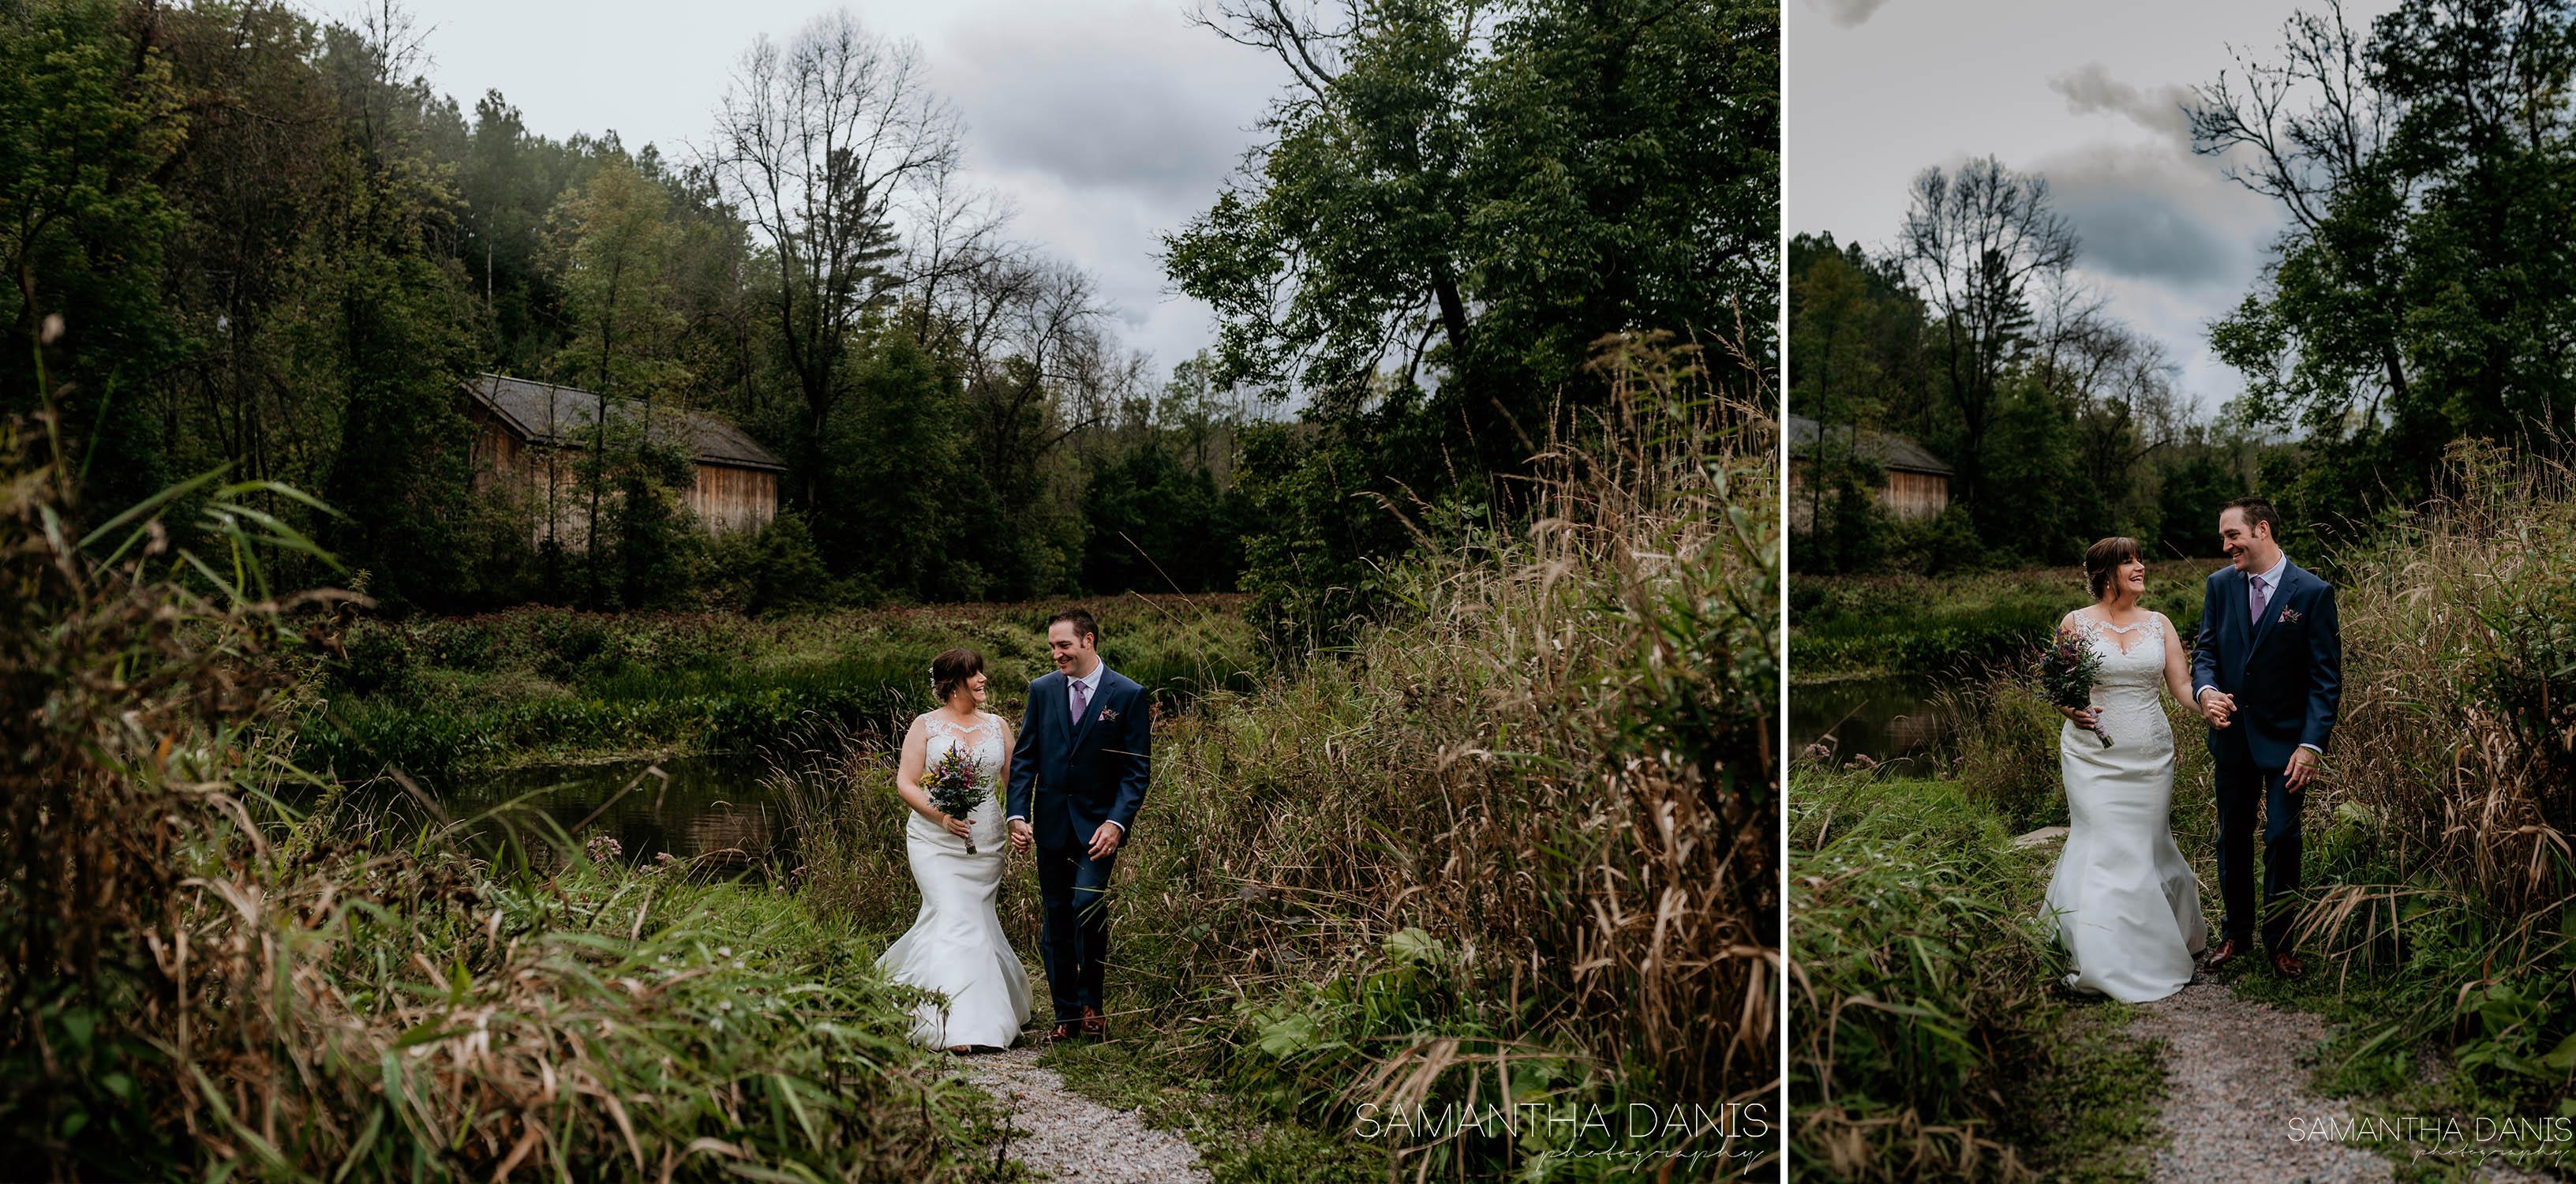 moulin de wakefield mill ottawa wedding photographer samantha danis photography